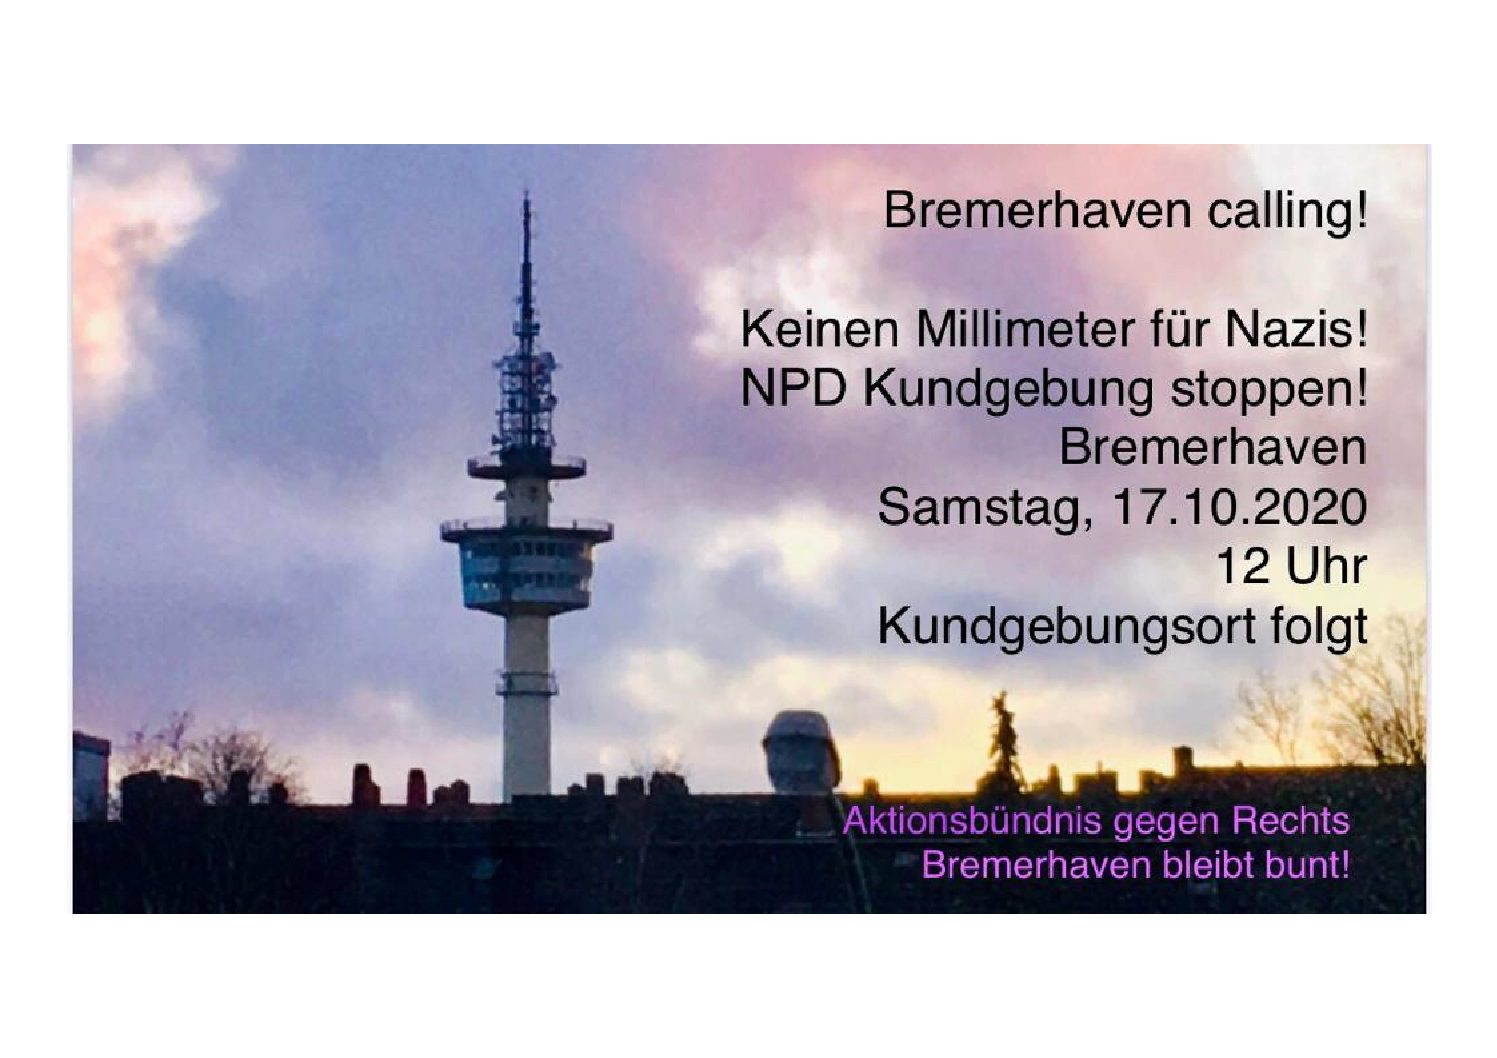 NPD Kundgebung stoppen! 17.10.2020 um 12.00 Uhr Stadttheater Bremerhaven